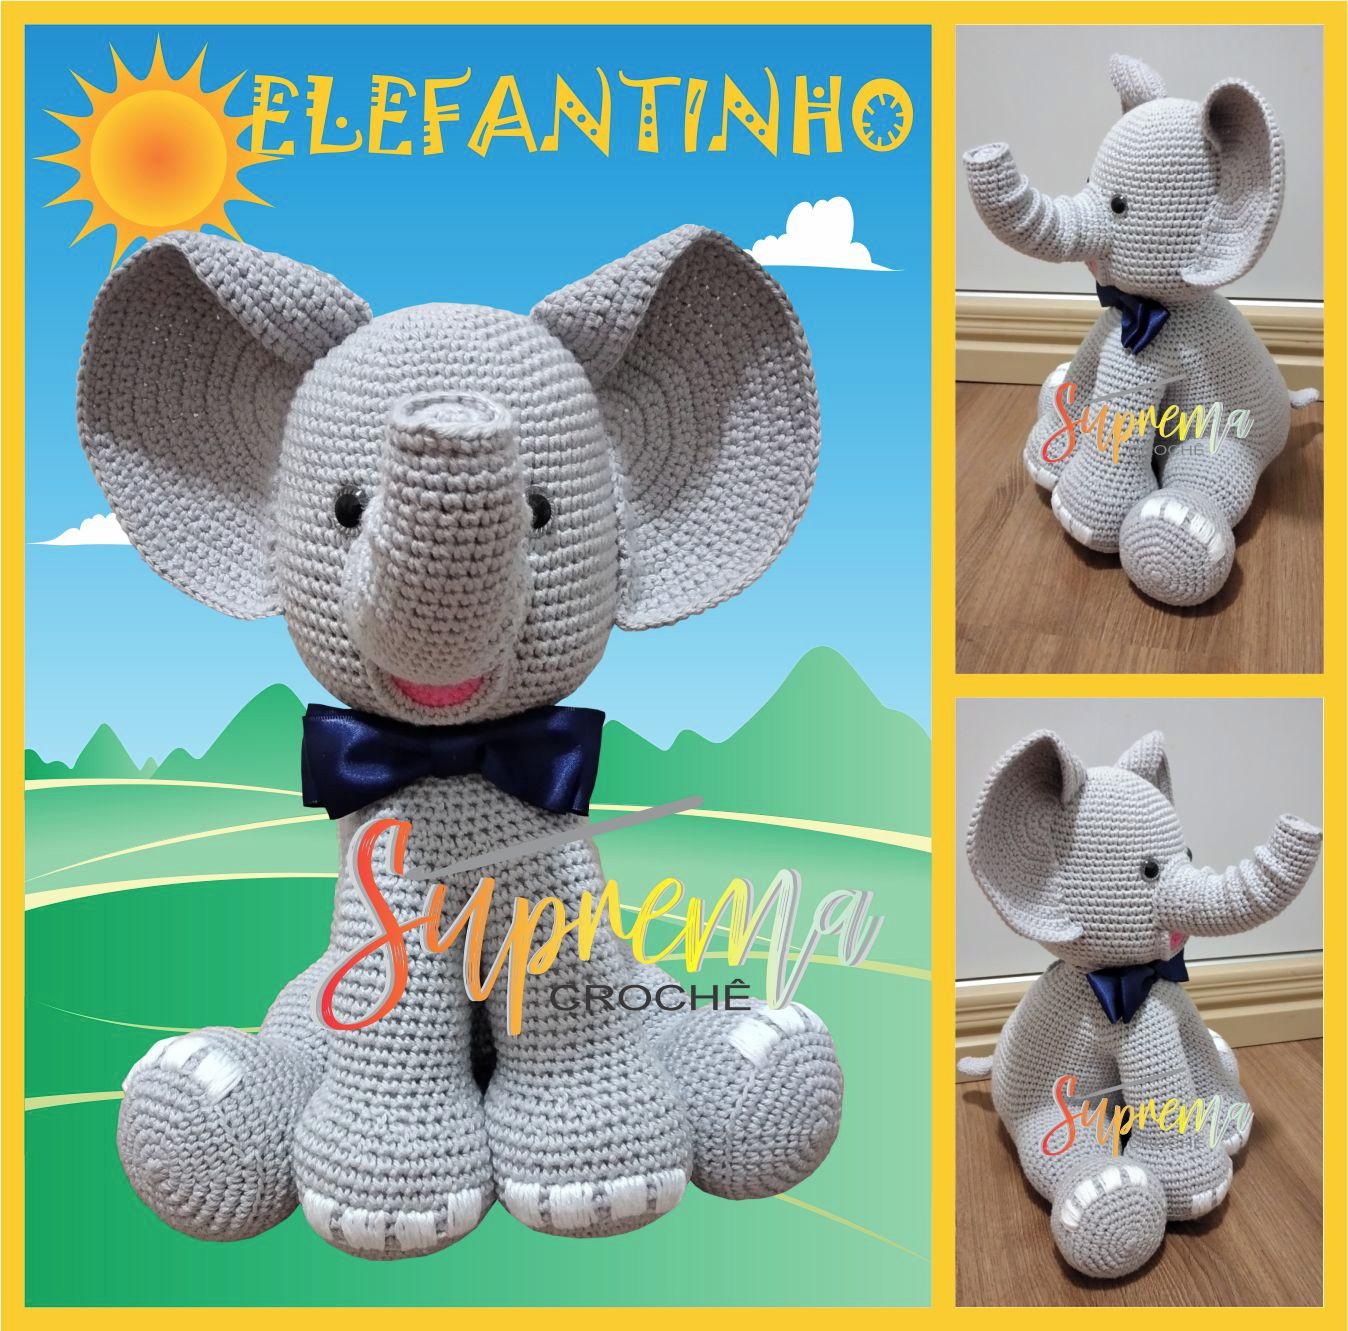 Amigurumi crochet pattern (English) - Ellie the elephant | Crochet ... | 1331x1348